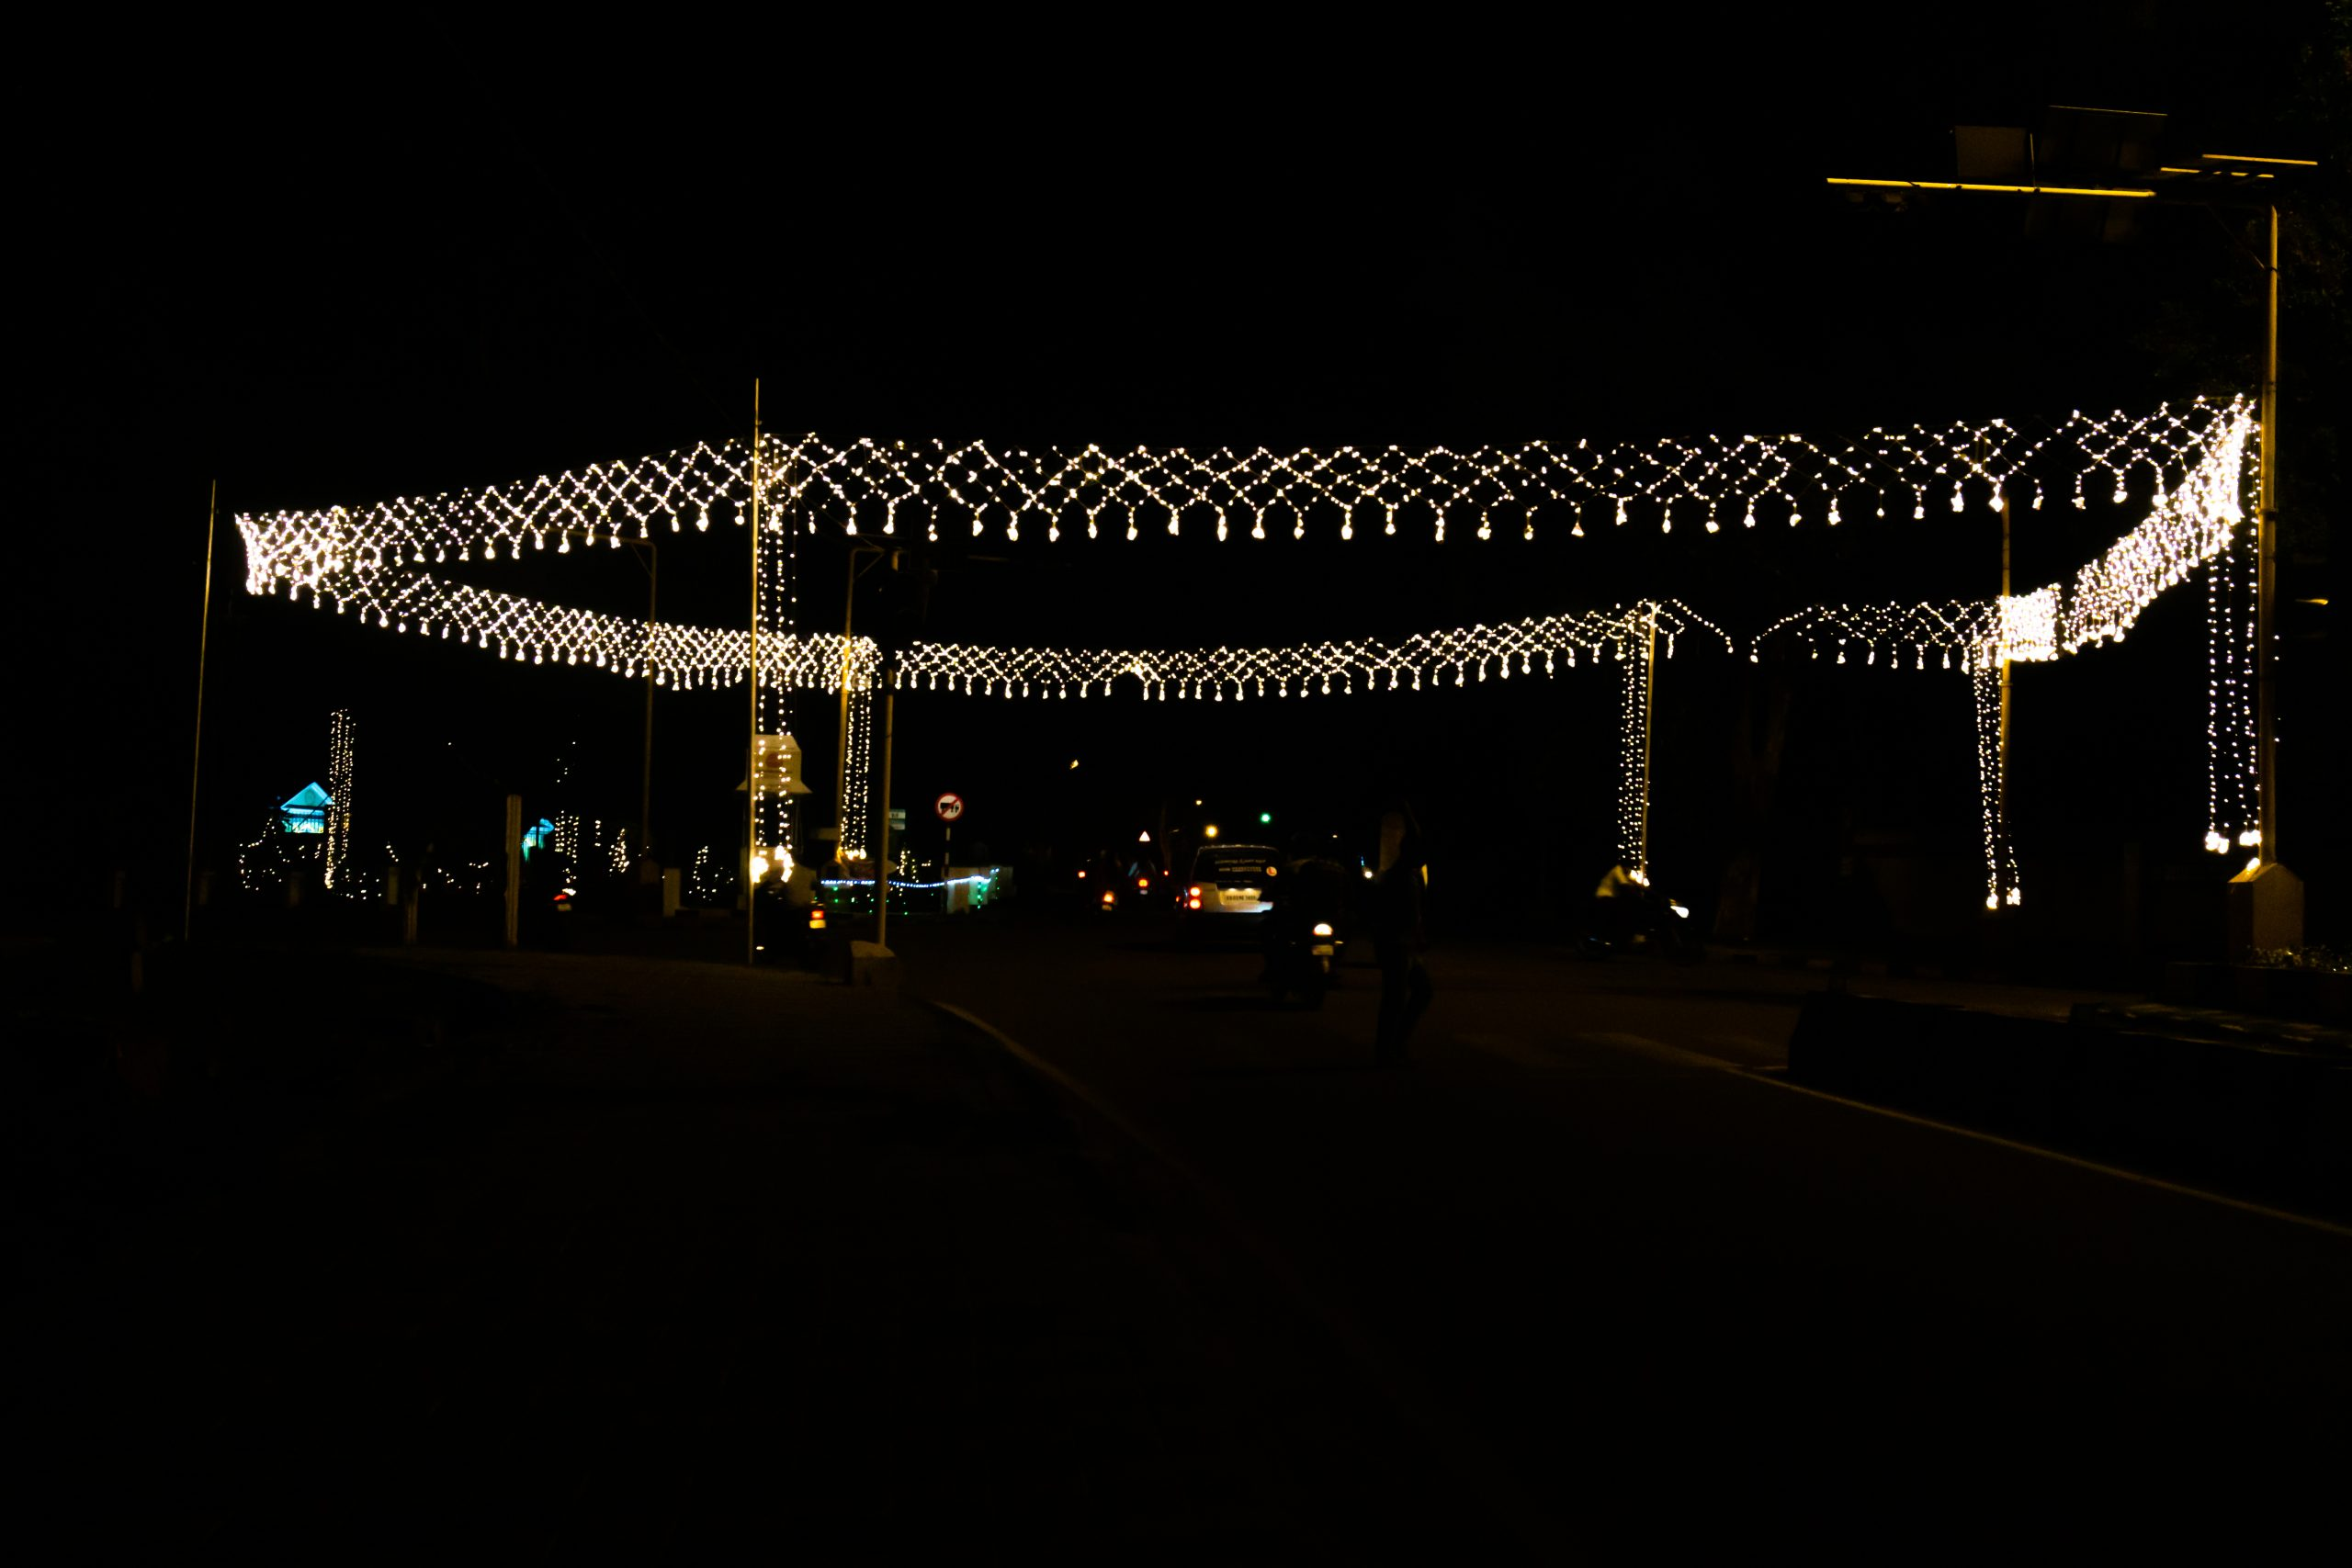 Lights illumination for Dussehra